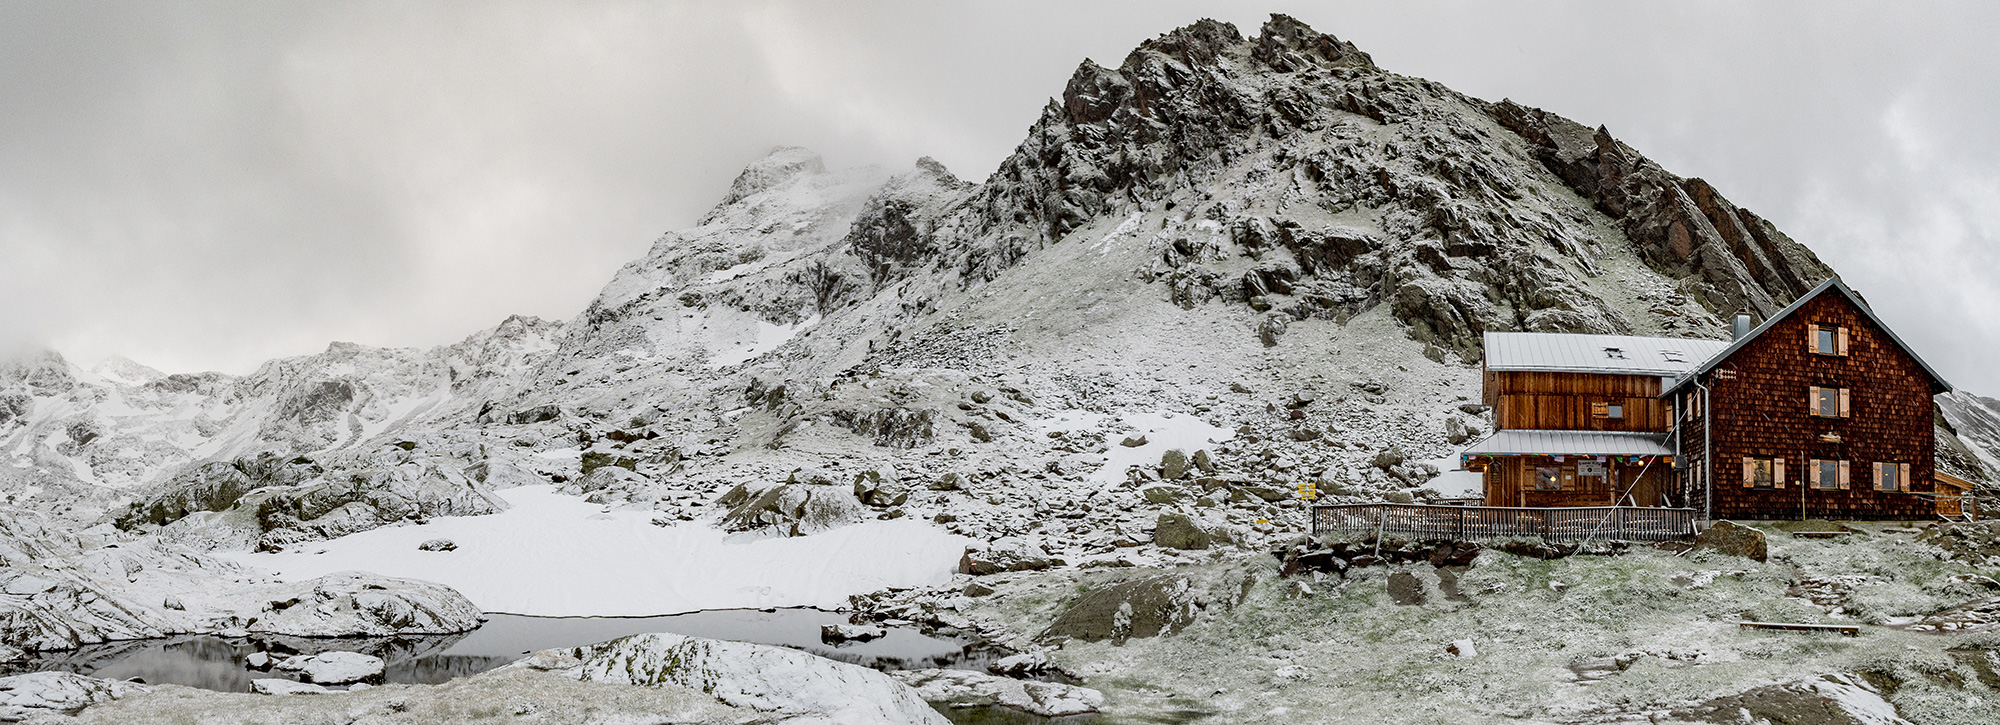 Erfahrung Infrarotheizung Stromverbrauch senken alpine Berghütte Wanderhütte